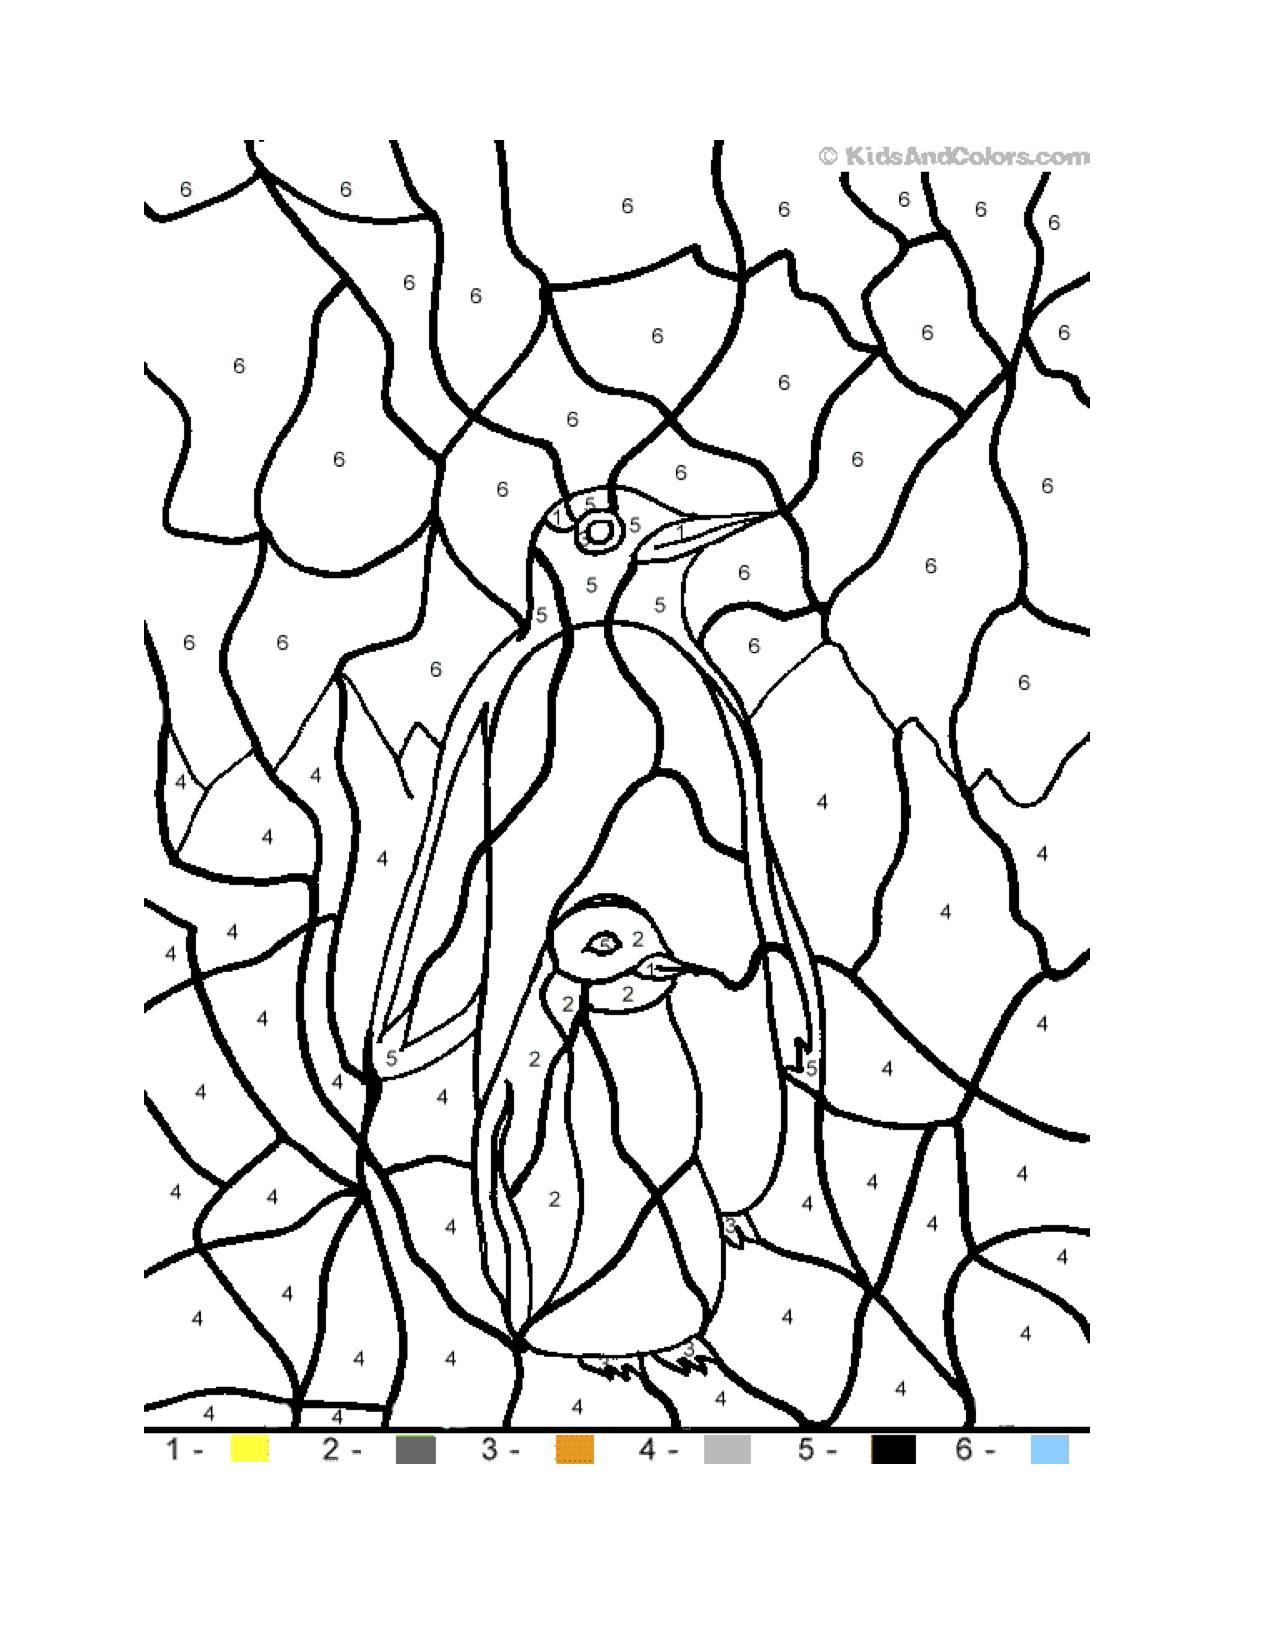 Letter P / Penguin color by number Penguin coloring